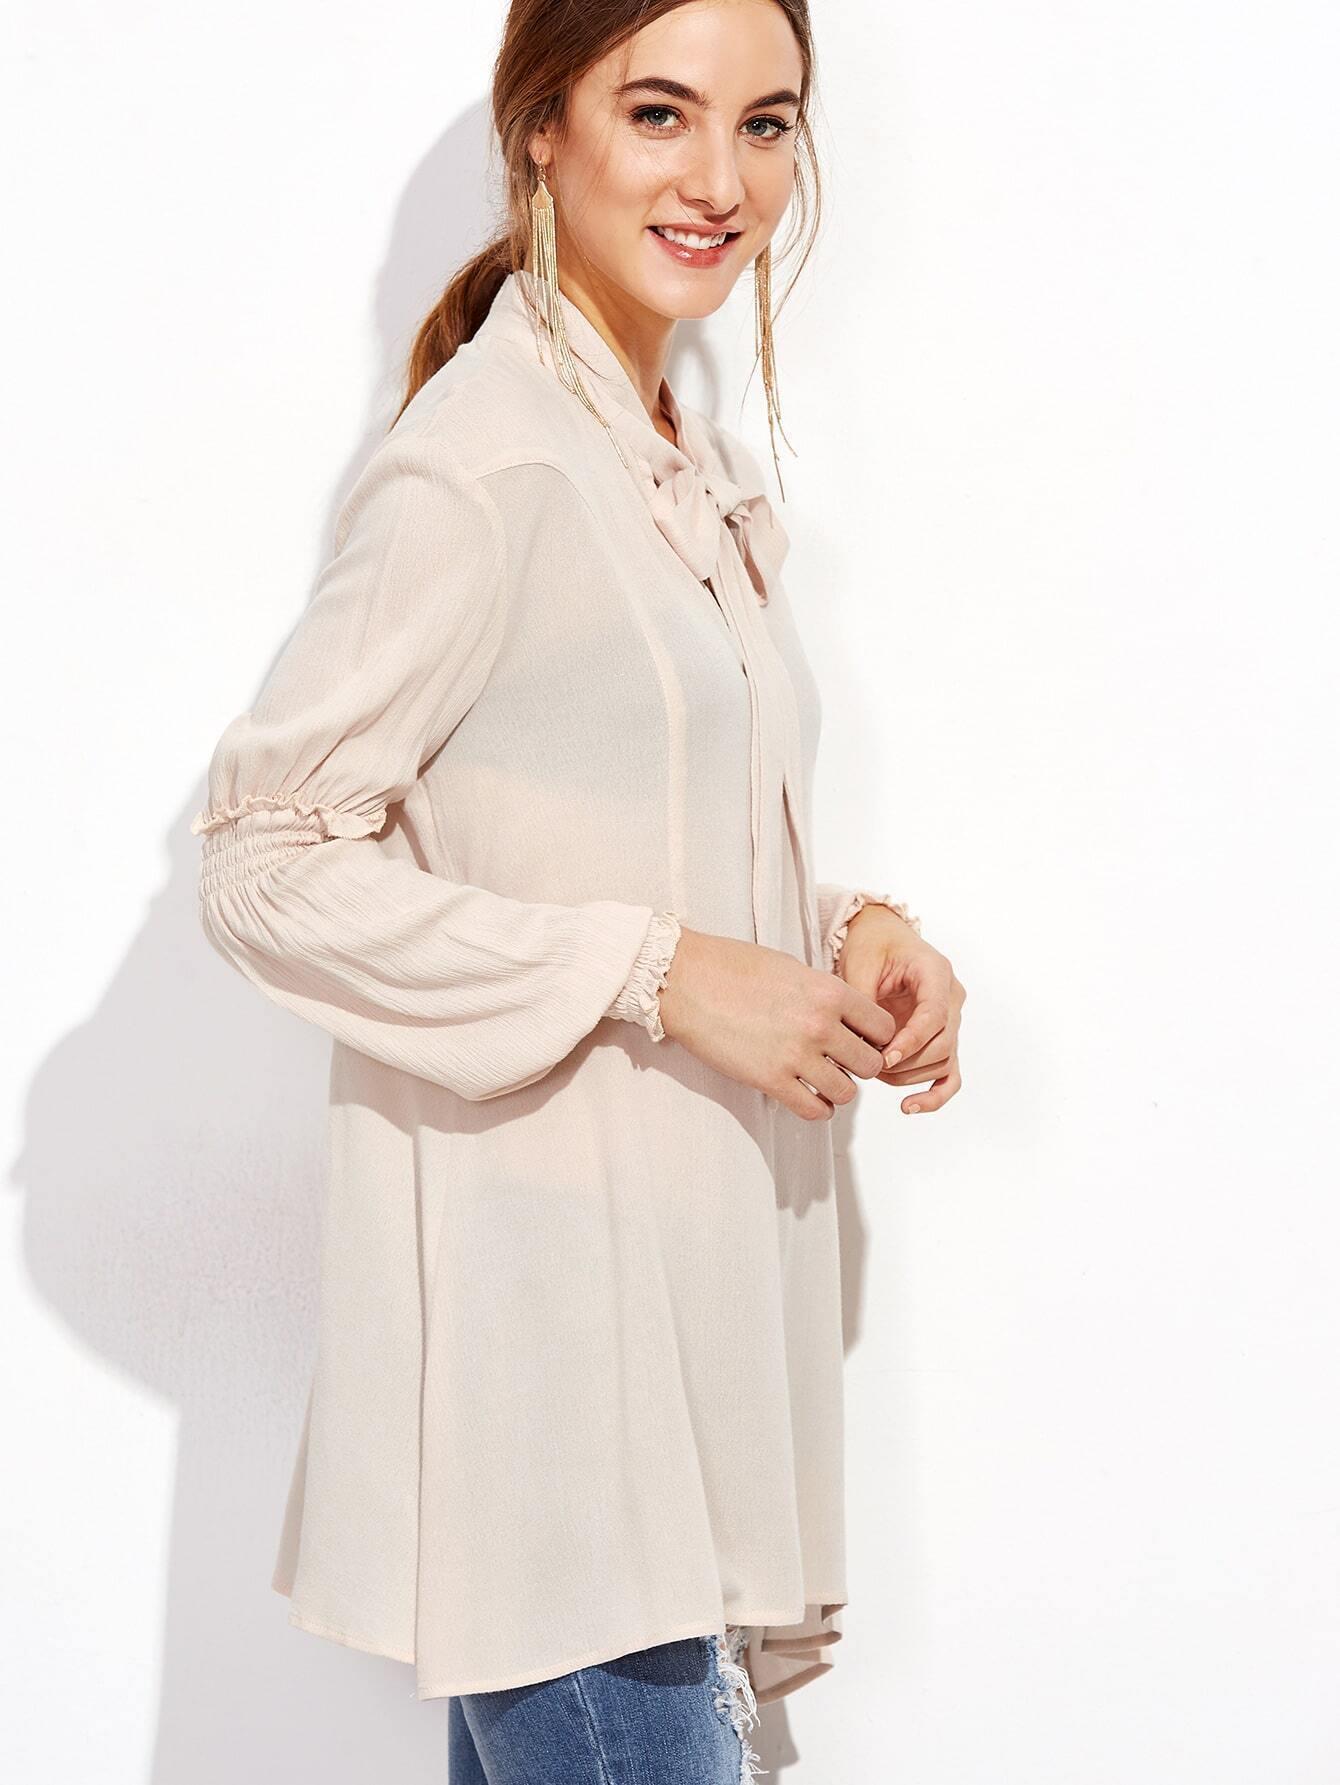 blouse161014002_2